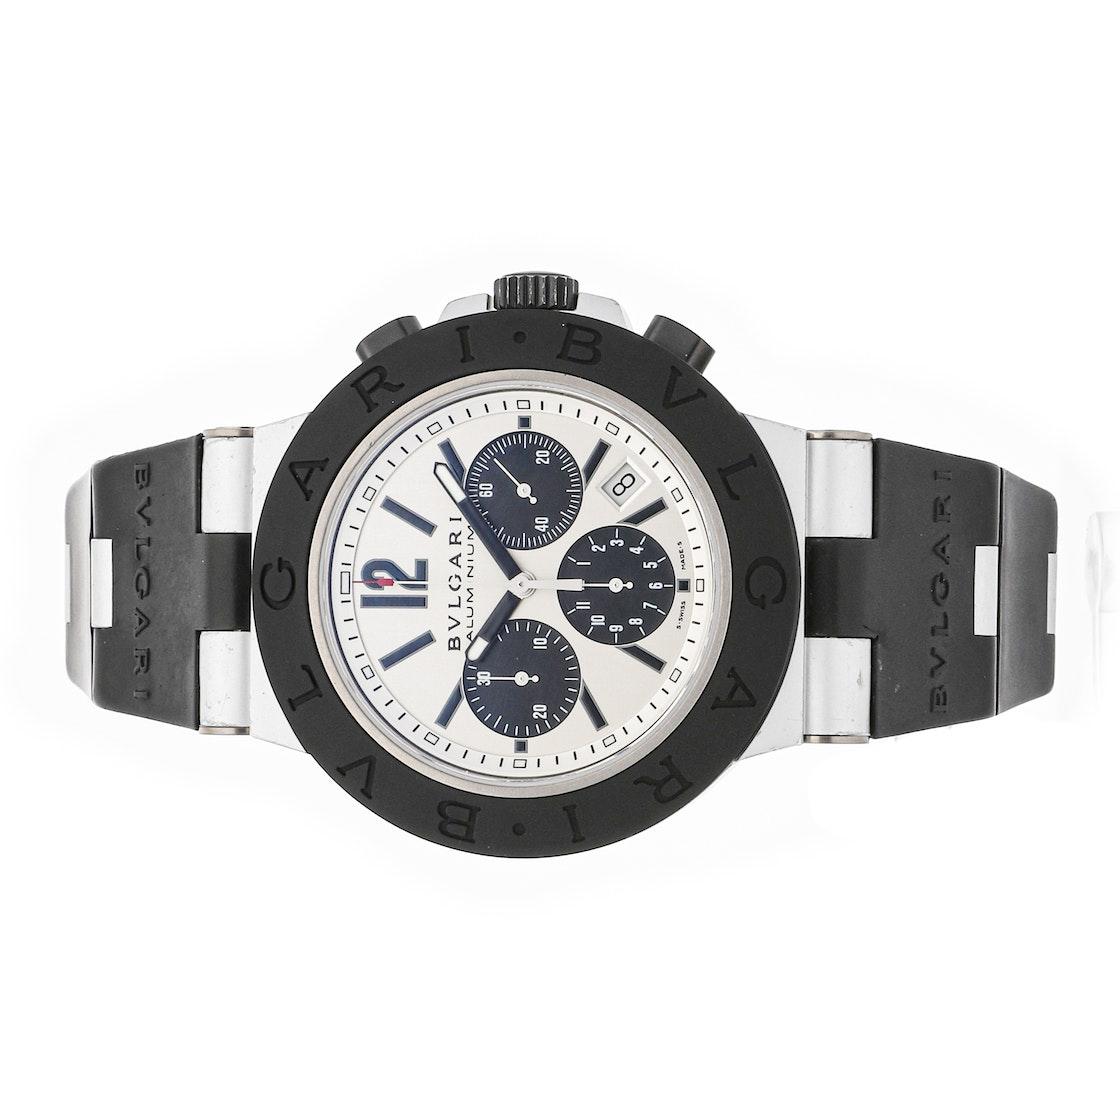 Bulgari Diagono Chronograph 101403